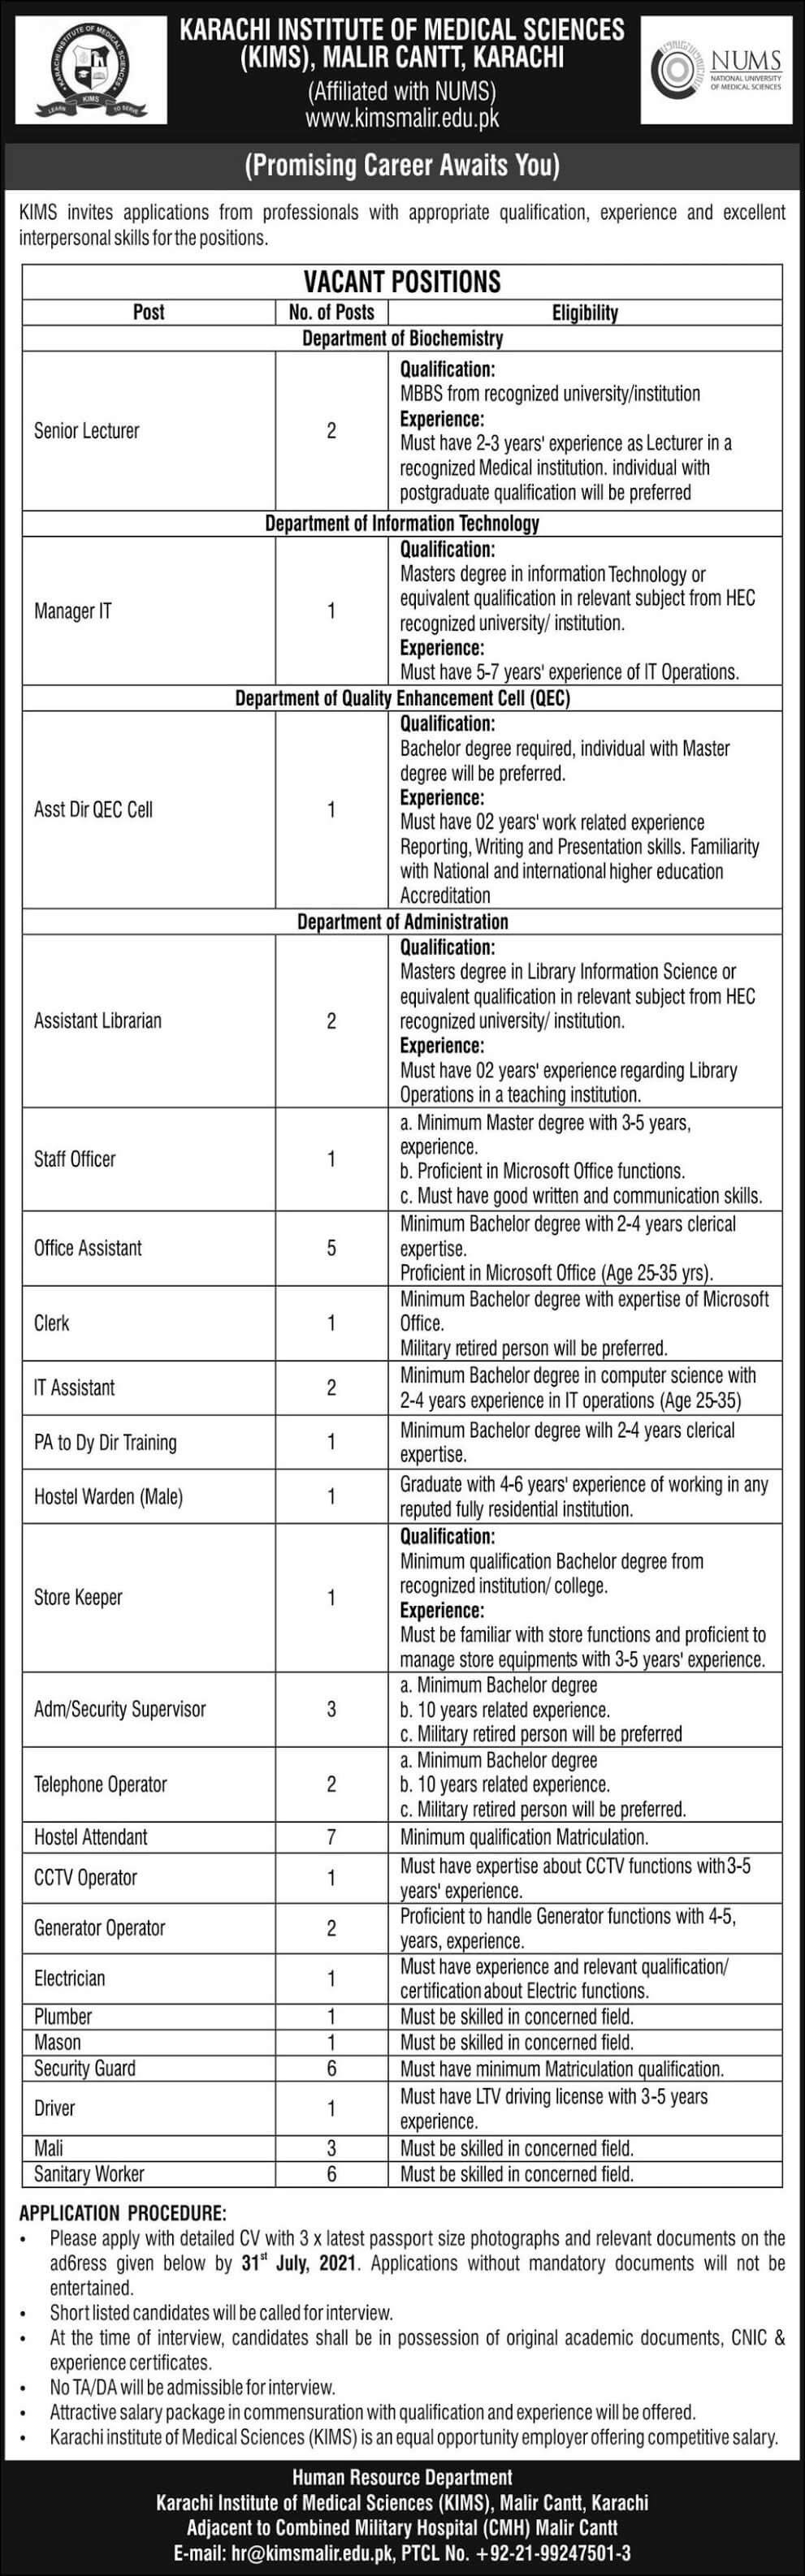 Karachi Institute Of Medical Sciences (KIMS) Jobs 2021 in Pakistan - www.kimsmalir.edu.pk Jobs 2021